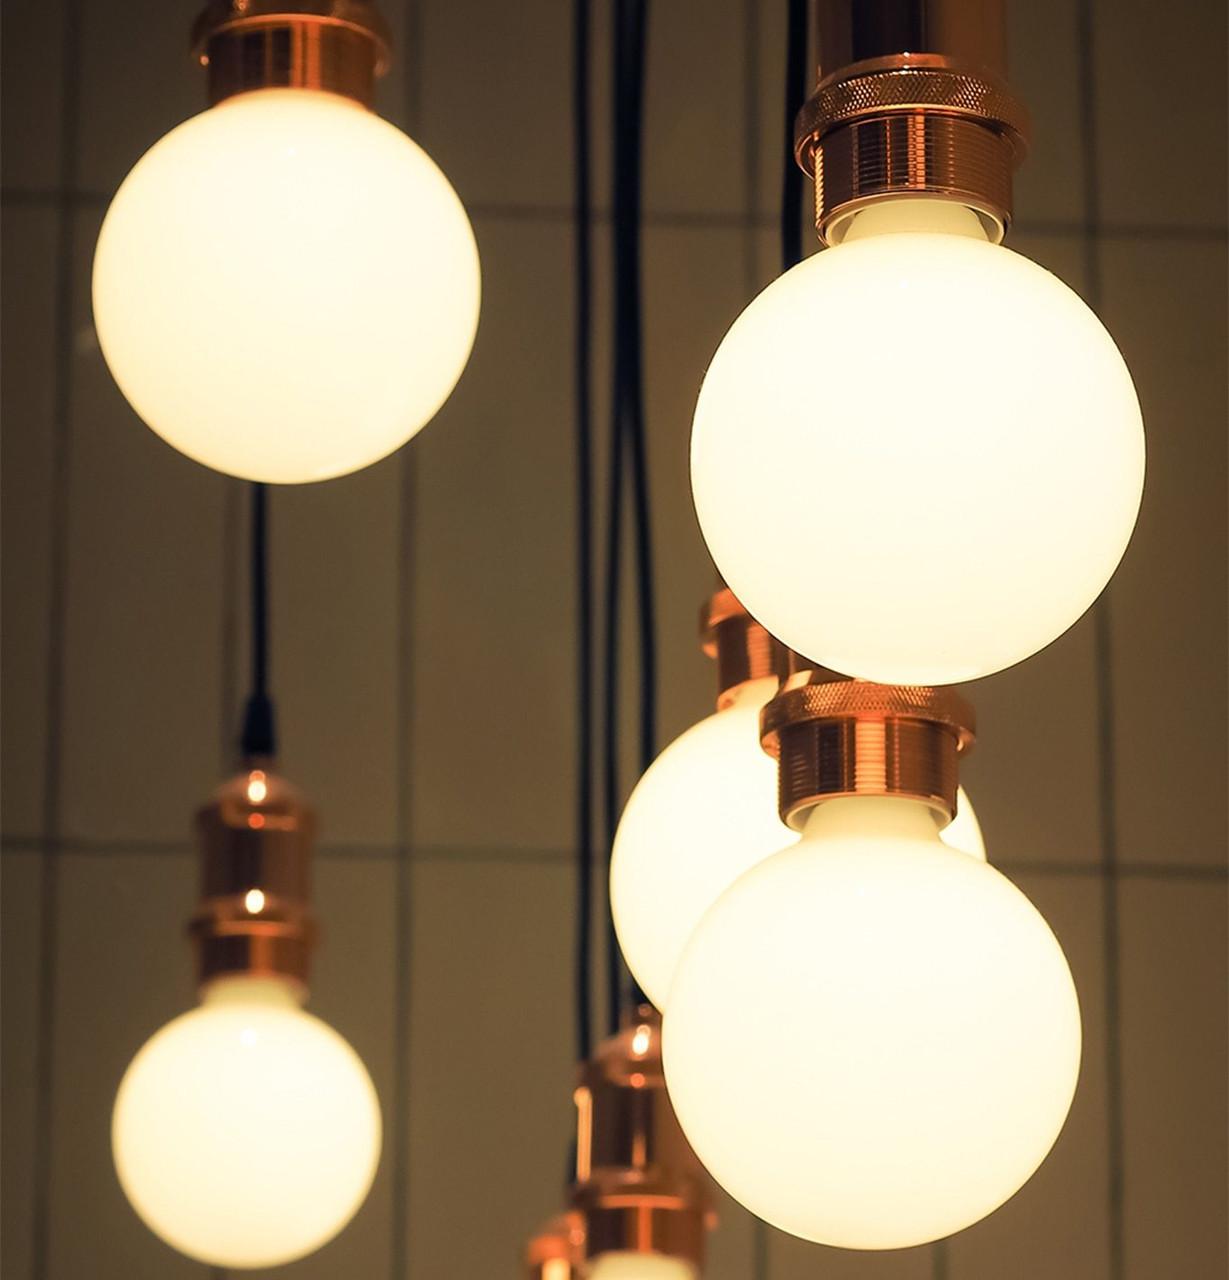 LED Dimmable G125 Antique Bronze Light Bulbs